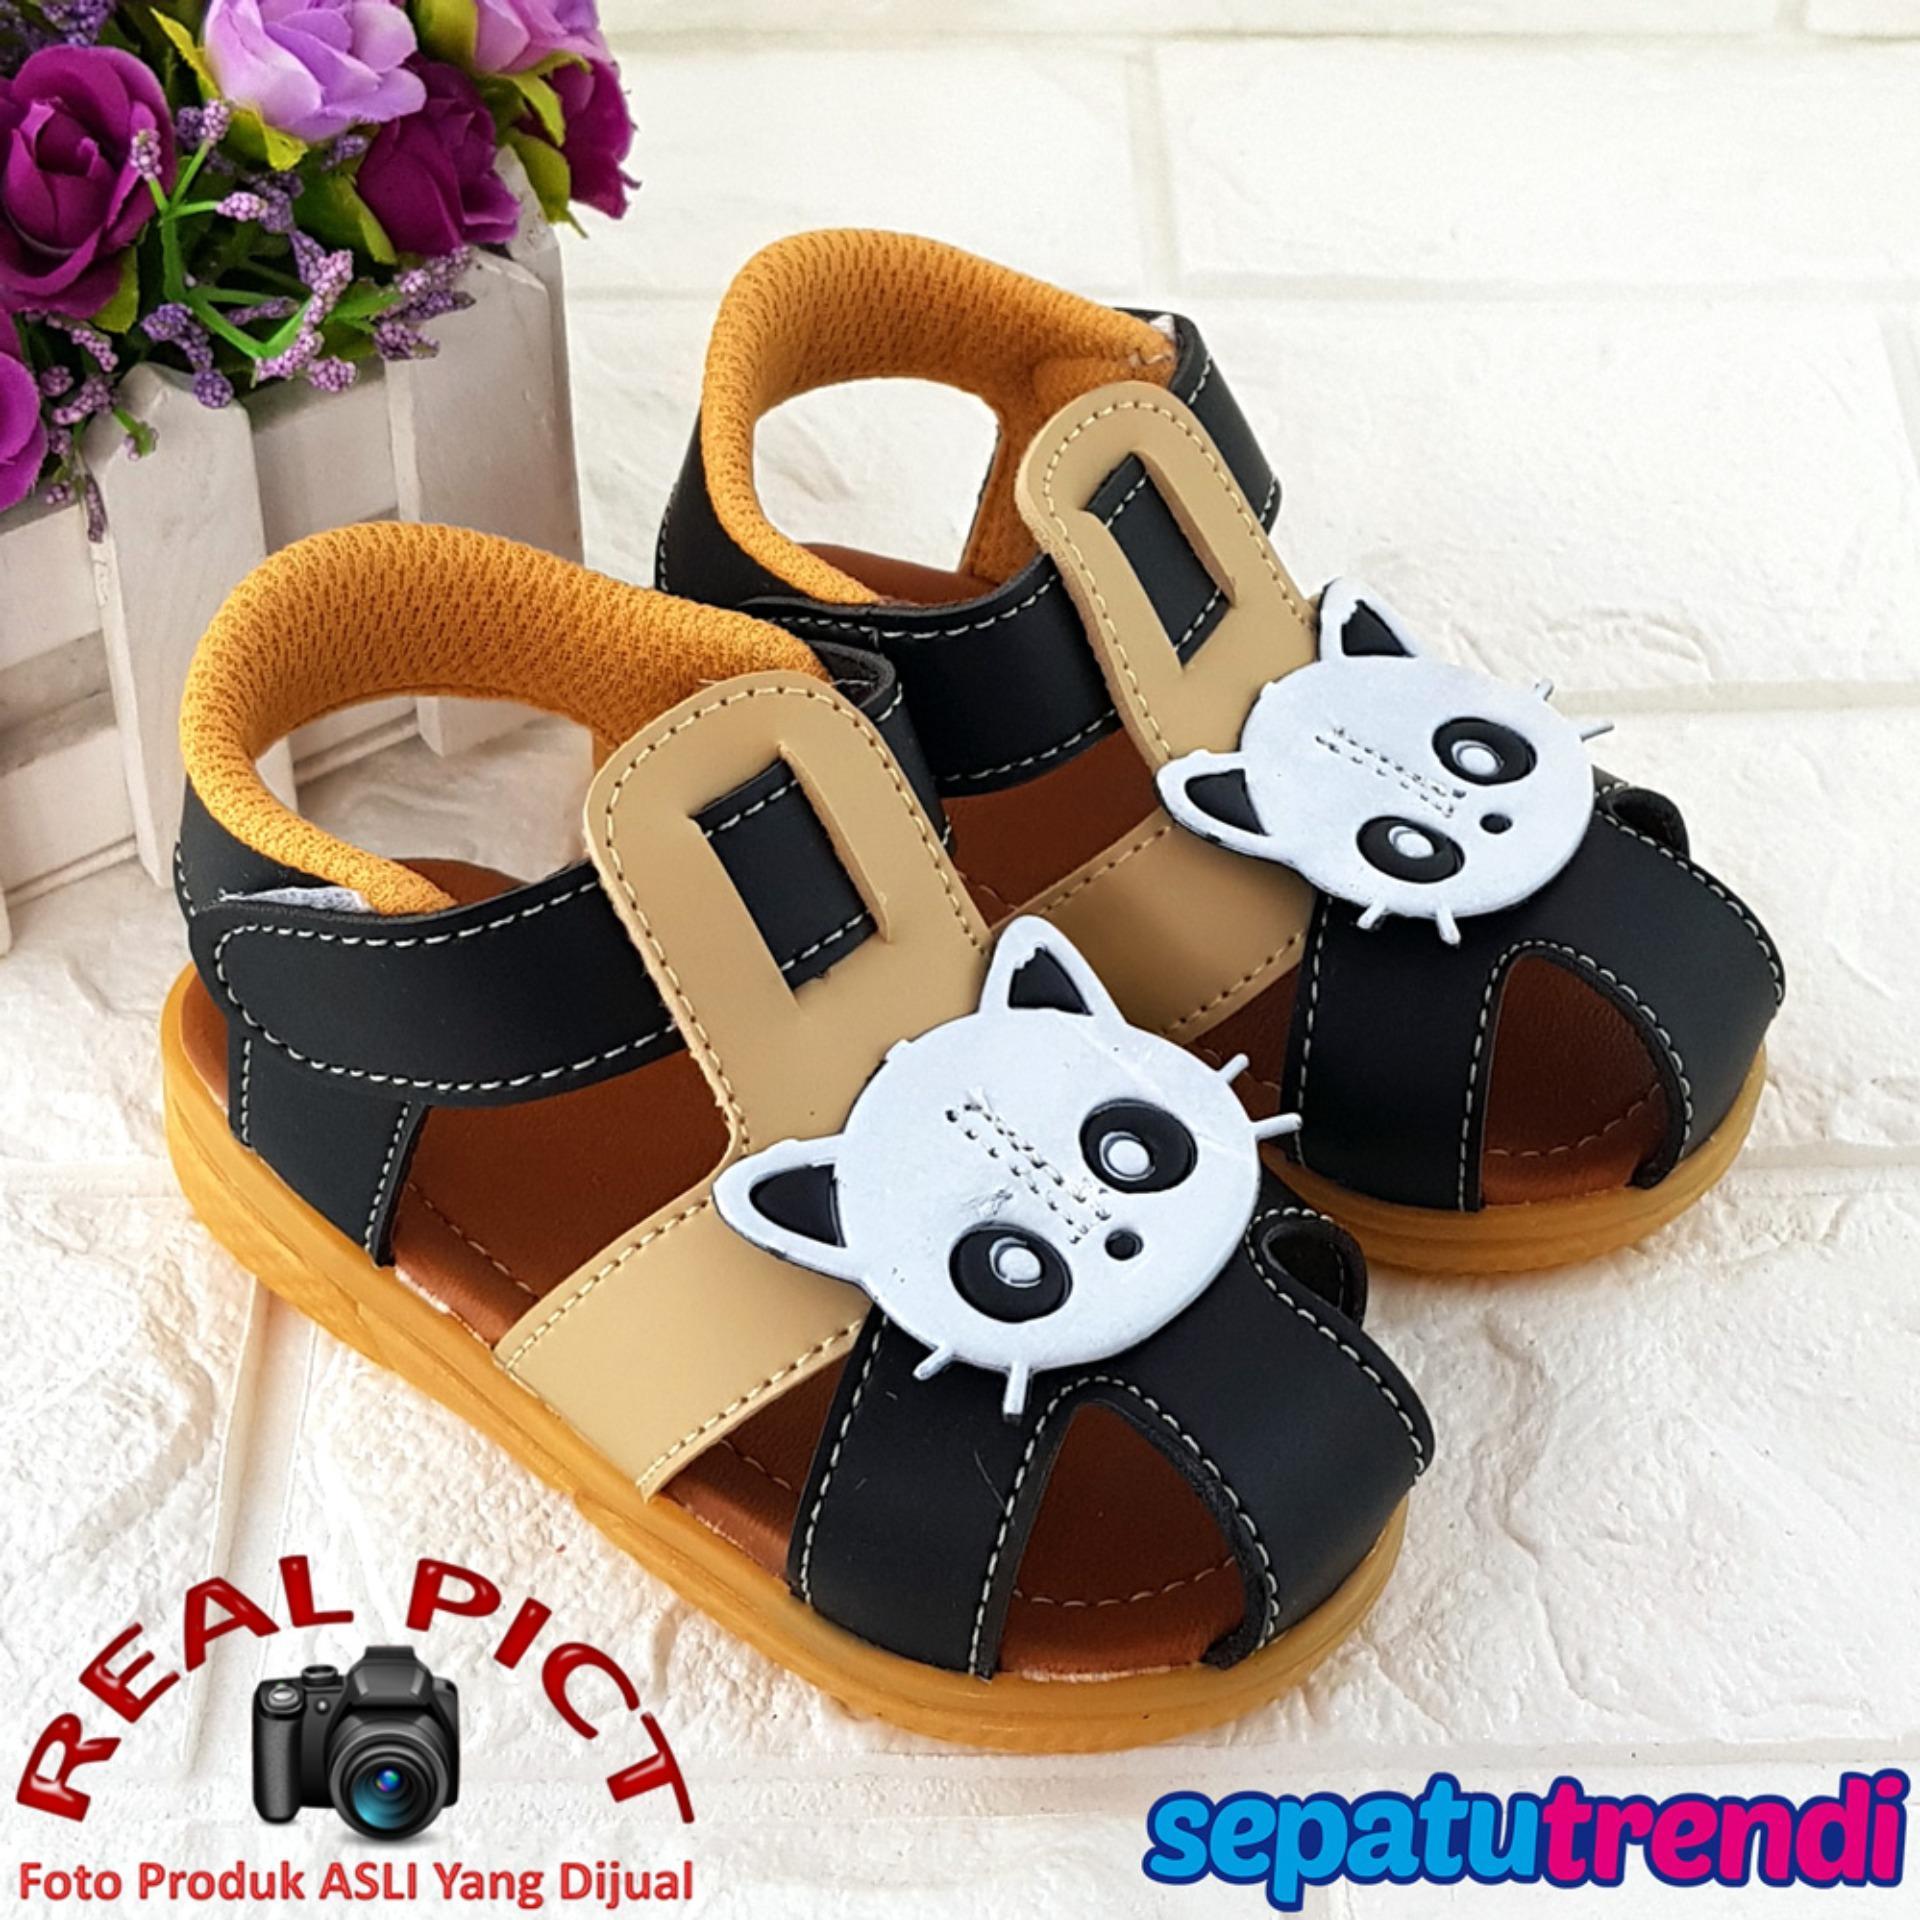 Beli Trendi Sepatu Sandal Anak Laki Laki Batita Bnkcat Trendi Asli